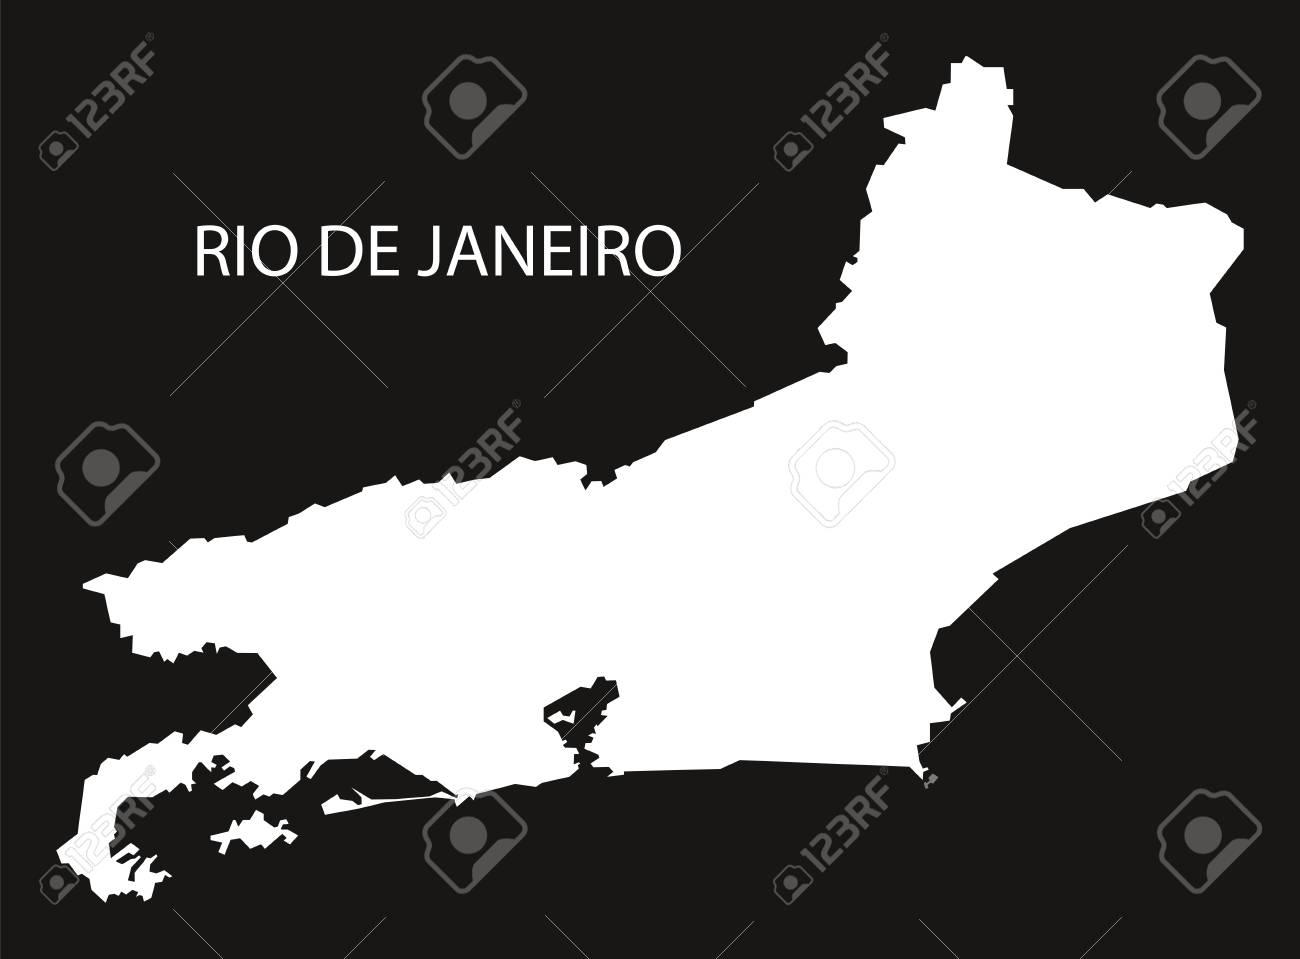 Rio De Janeiro Brazil Map Black Inverted Silhouette Royalty Free ...